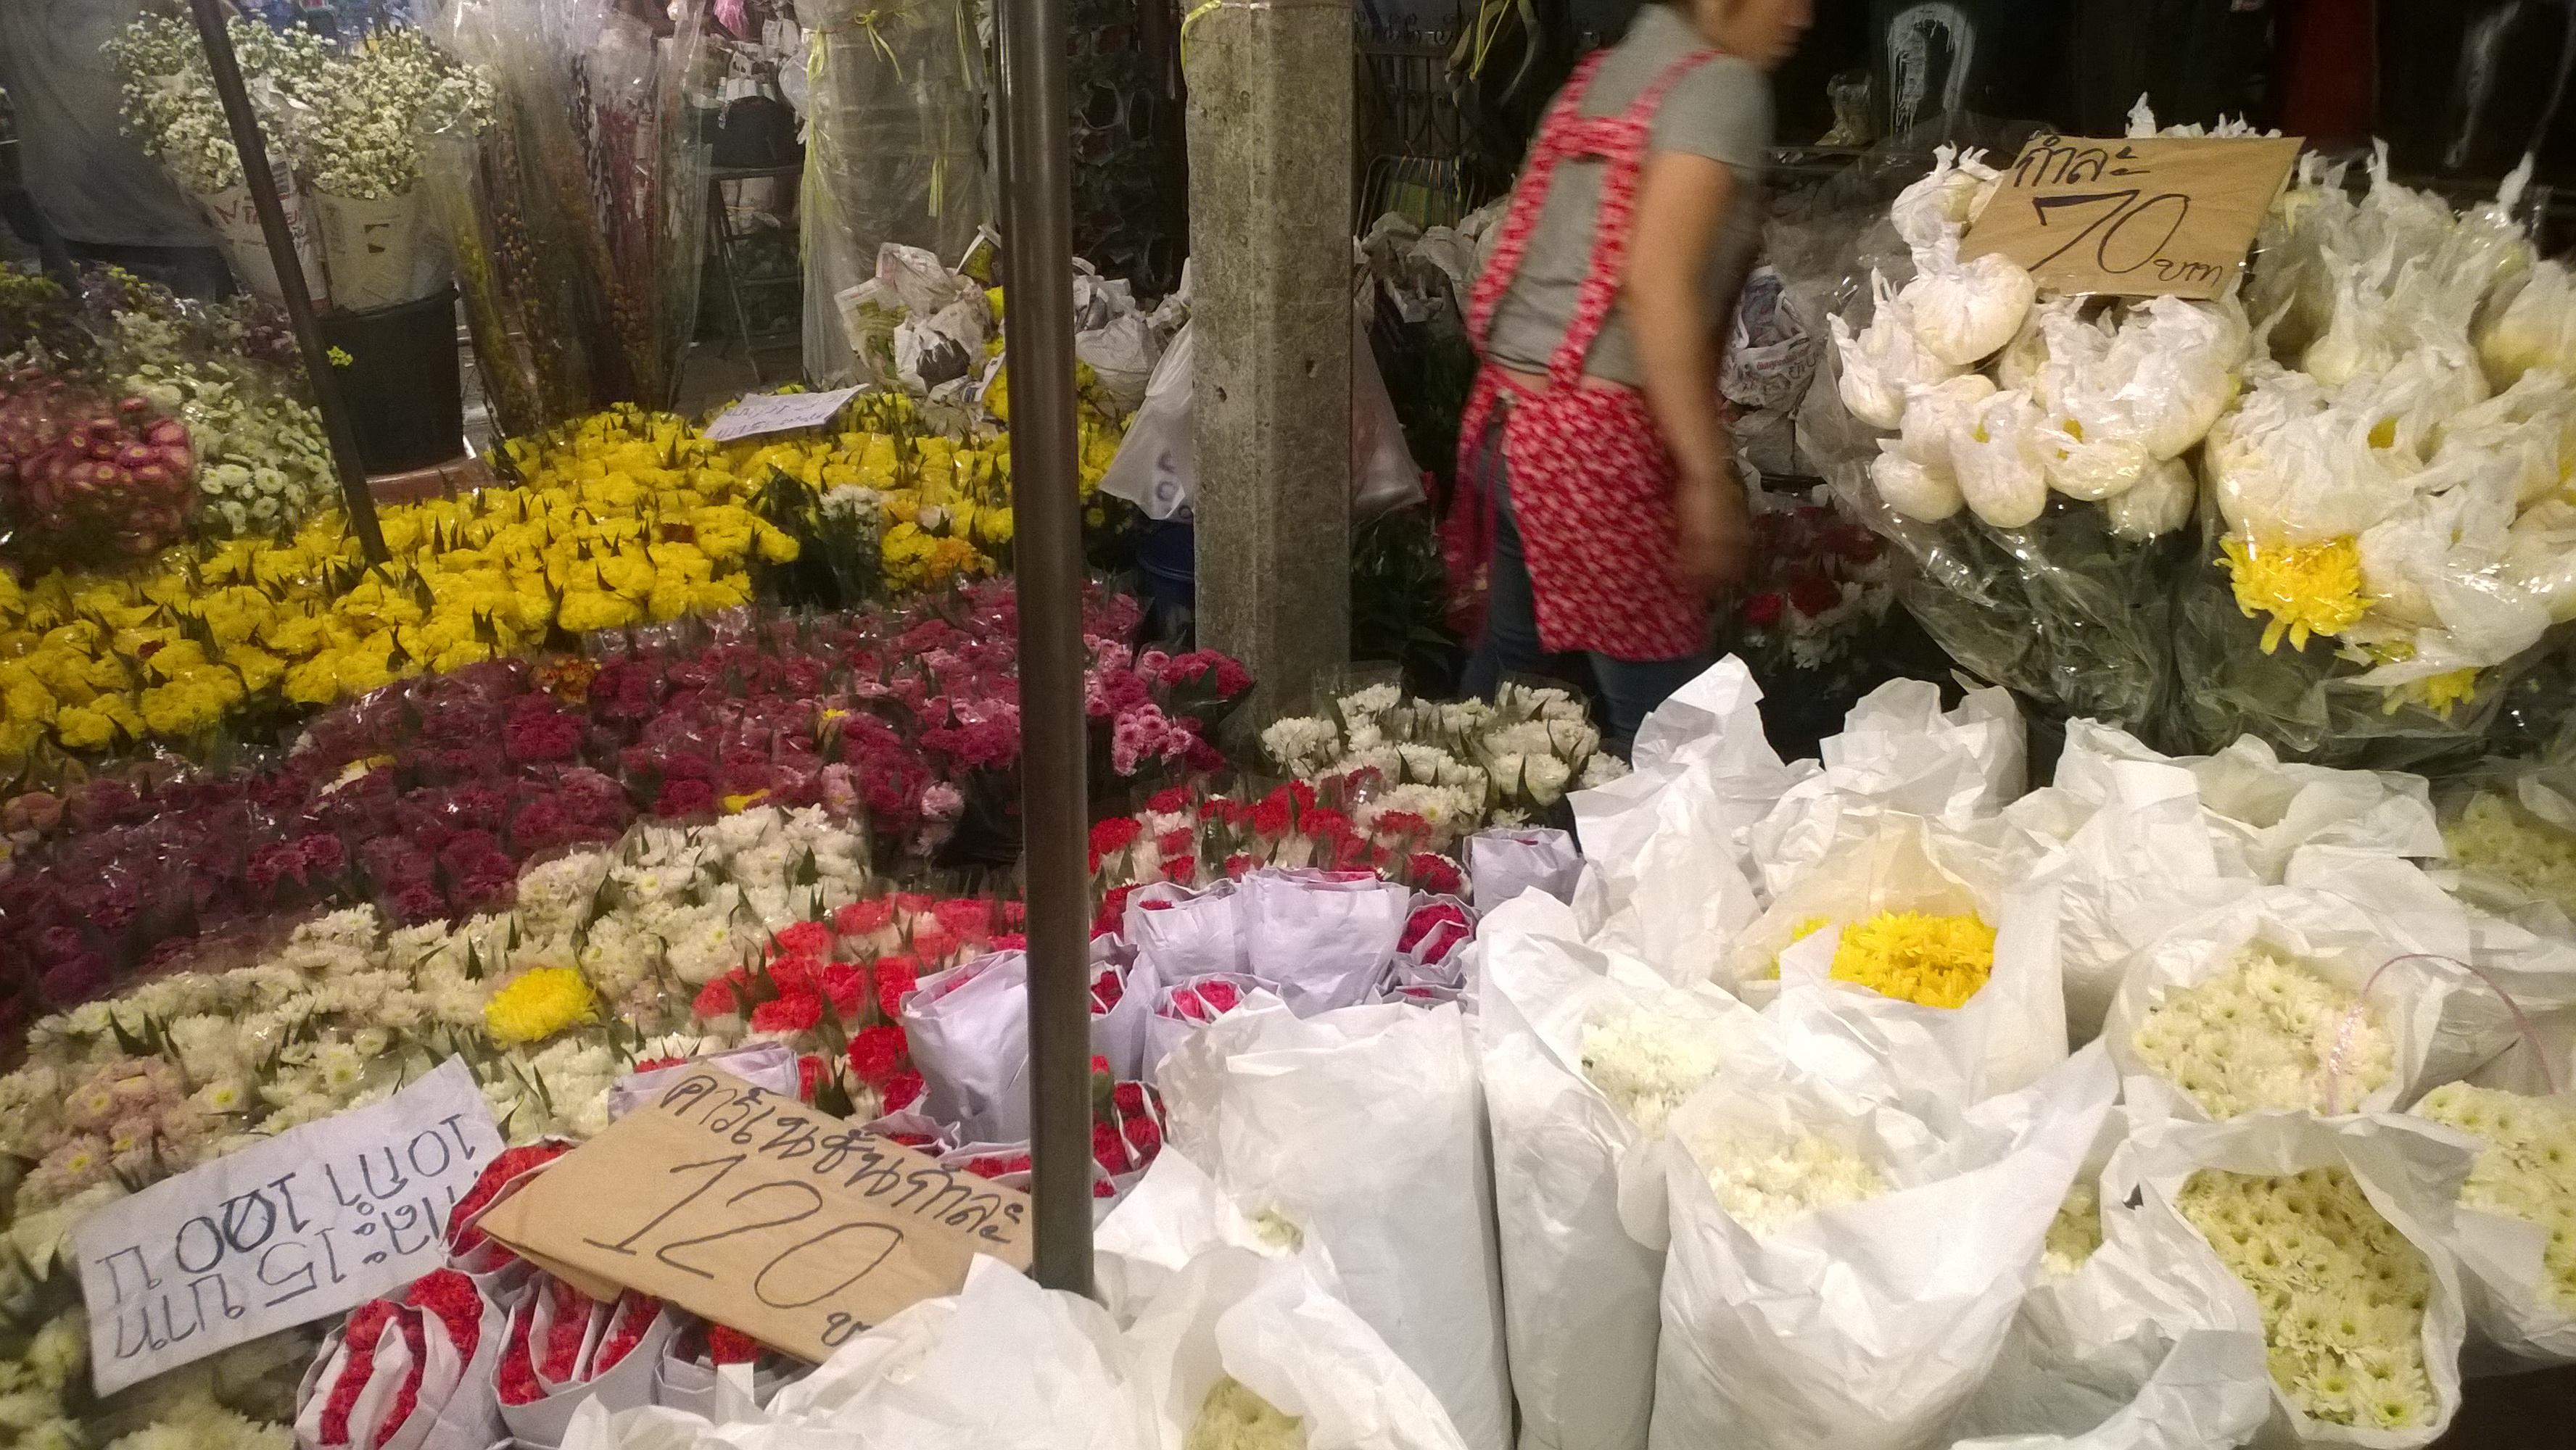 Thailand Bangkok Pak Khlong Talat - flower market ovedc 05.jpg